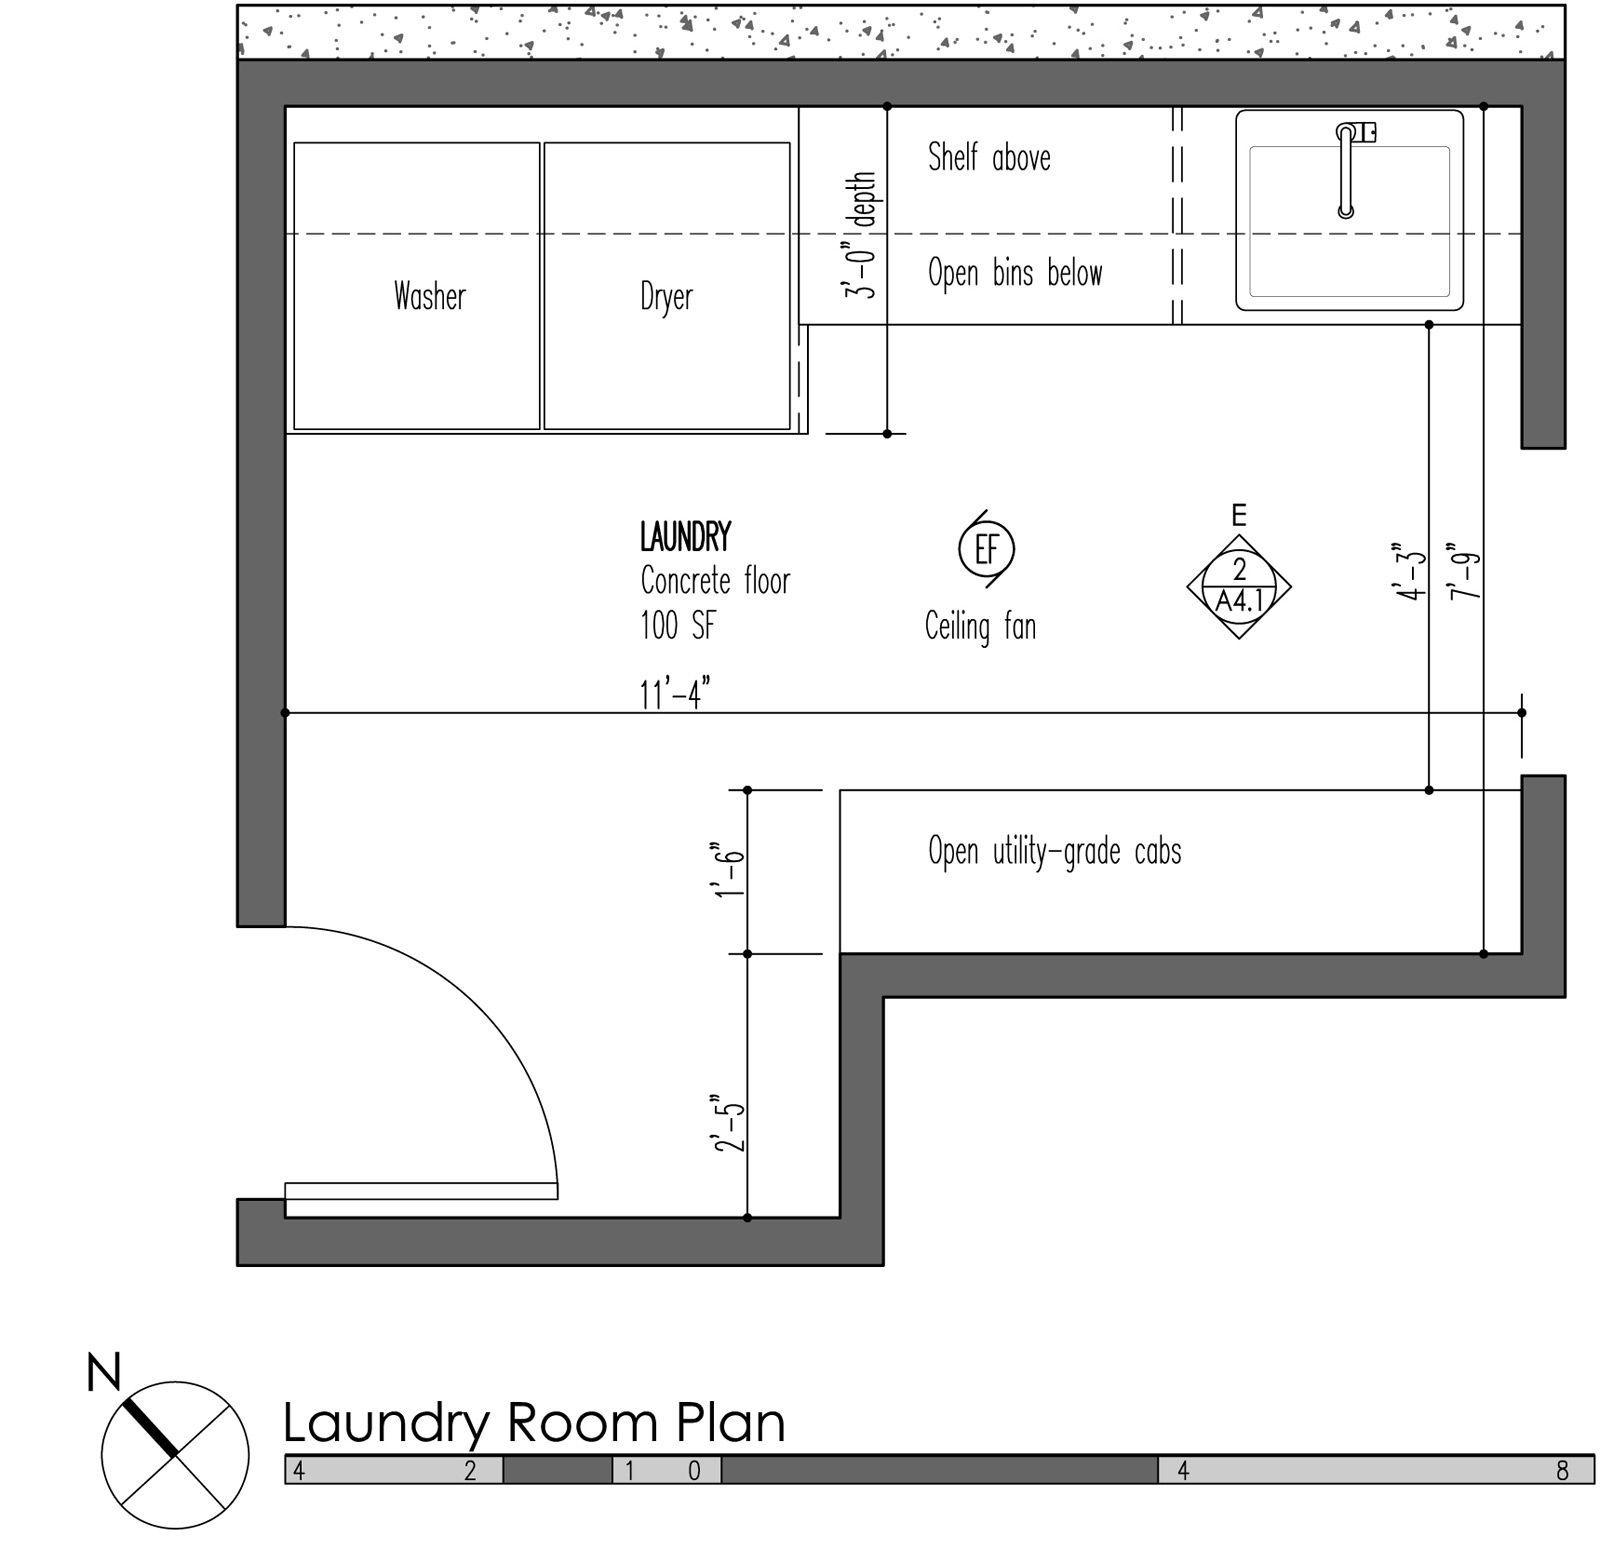 Laundry Room Design Plans Laundry room design, Laundry